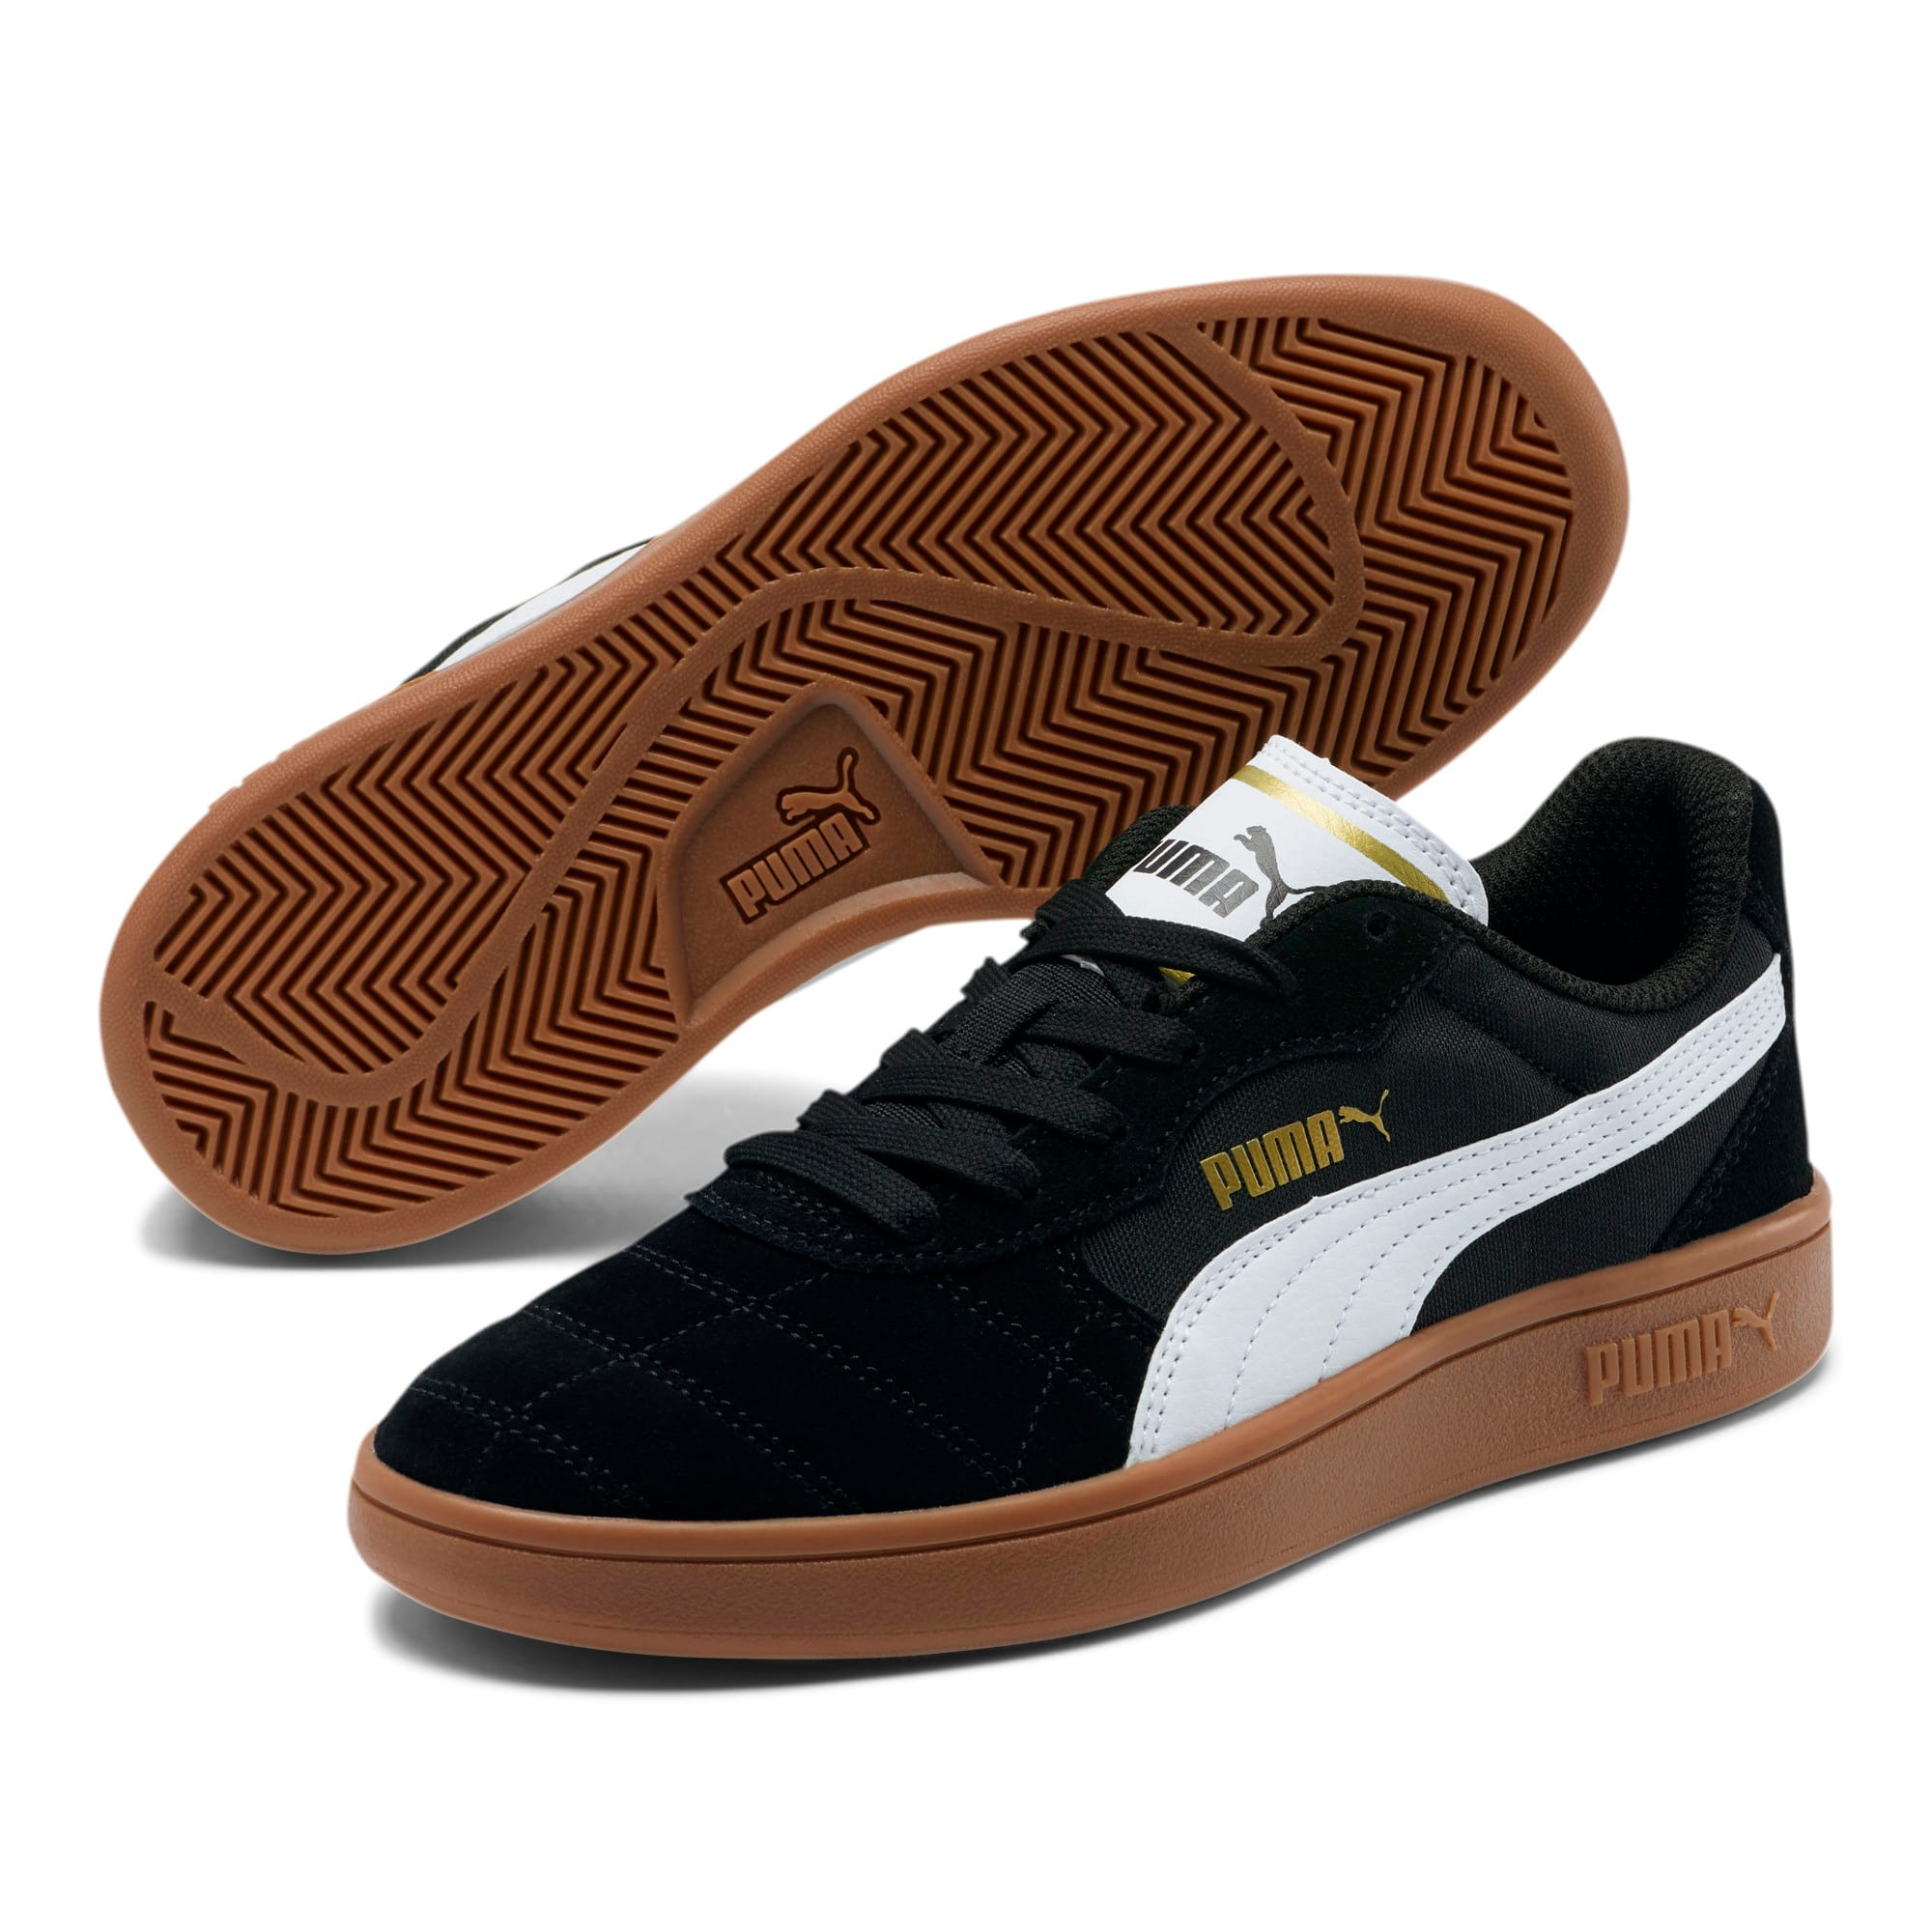 Thumbnail 2 of Astro Kick Sneakers JR, Puma Black-Puma White-Gold, medium